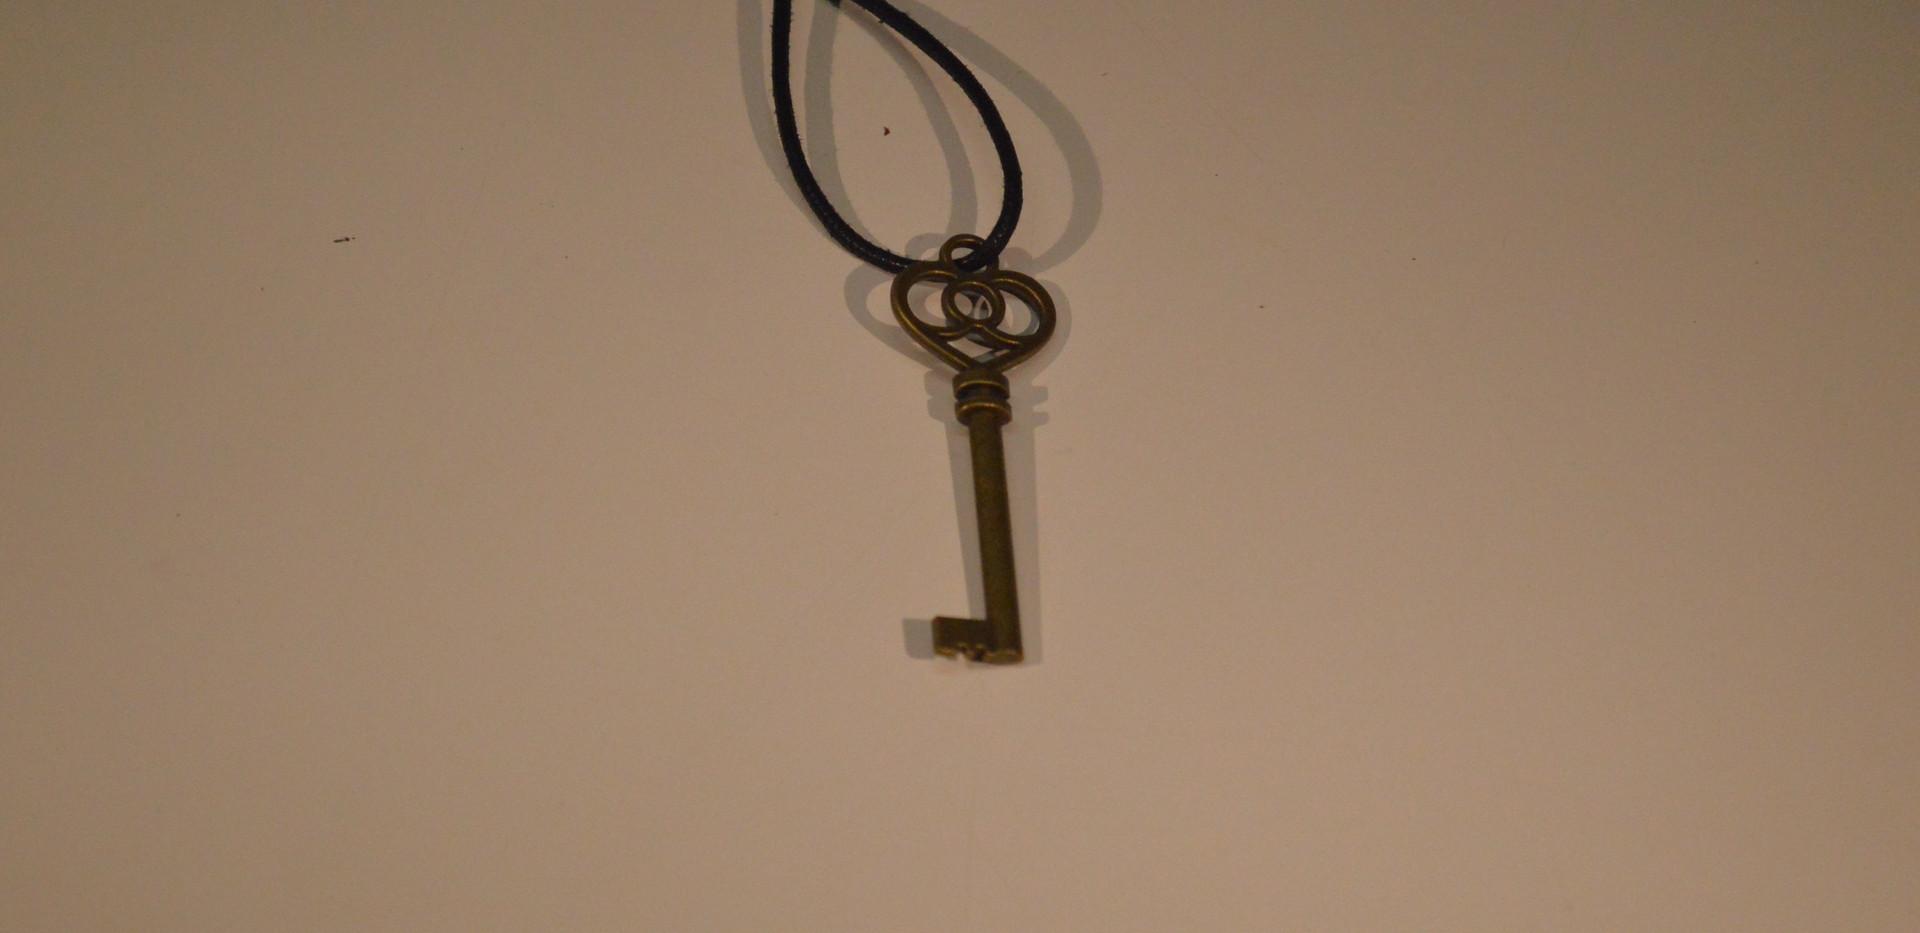 collier cléf n°4